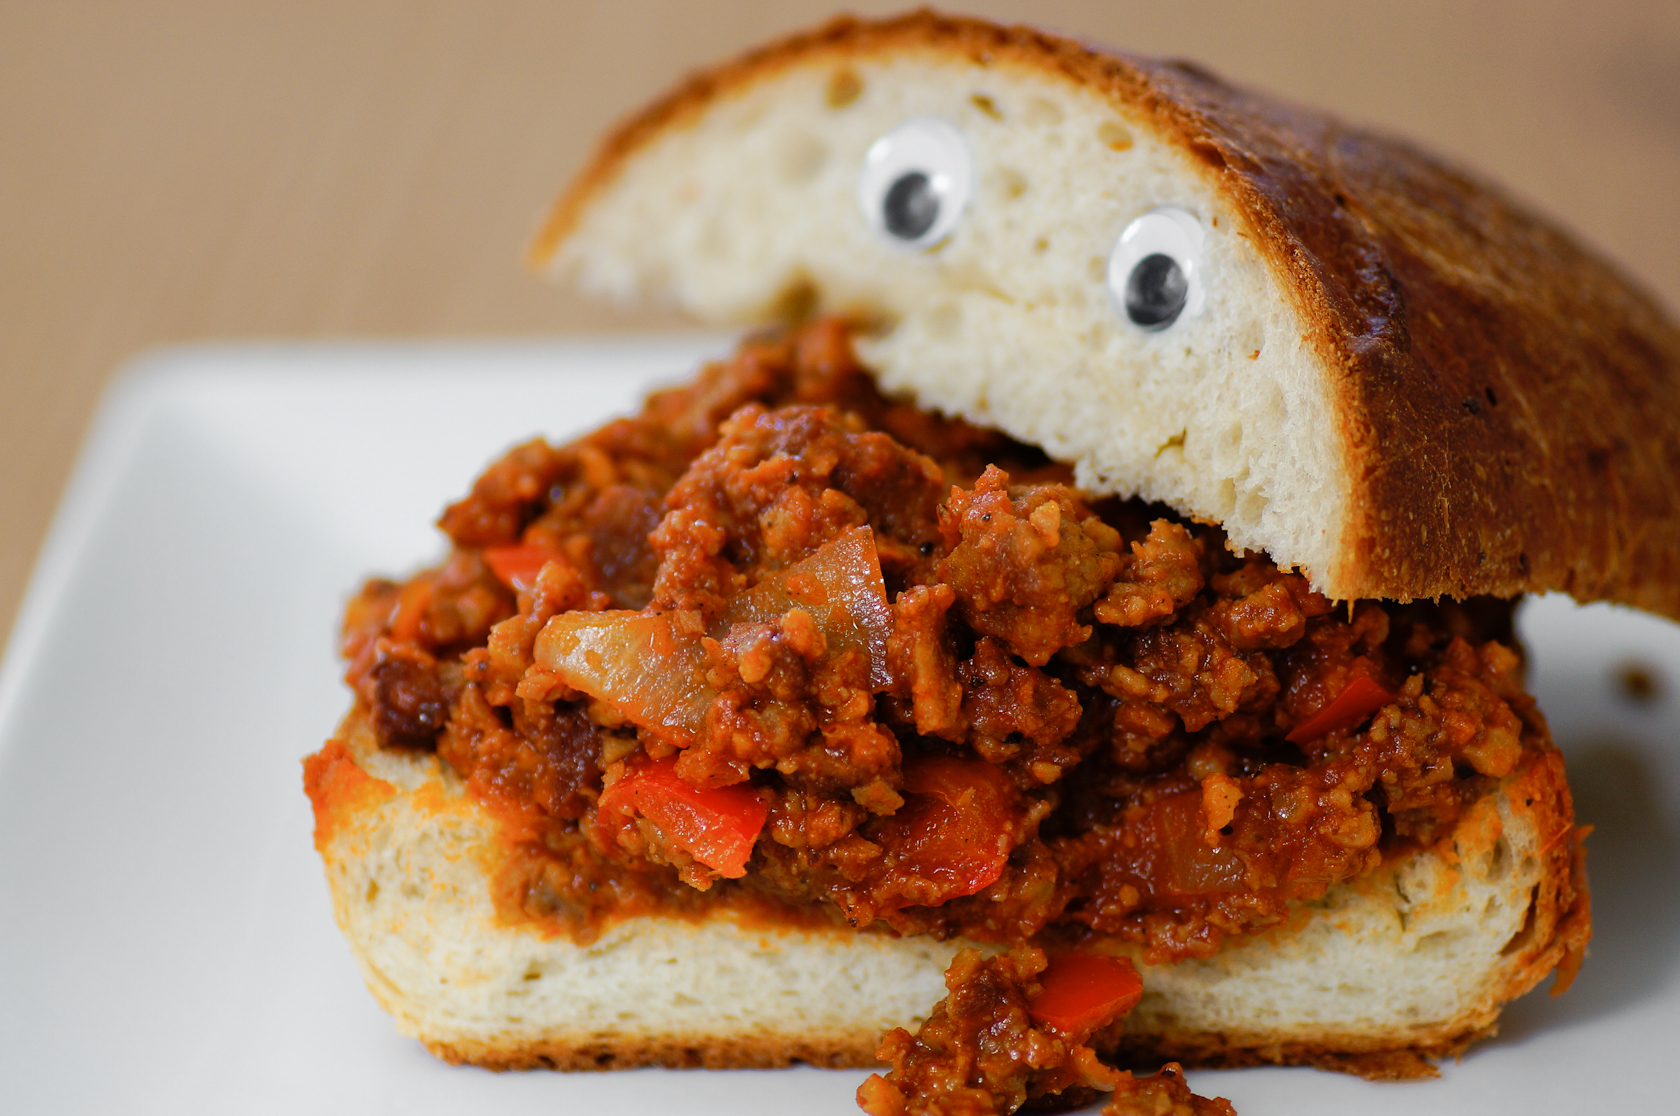 Sloppy Joes: Vegetarian meat mix between two halves of bread